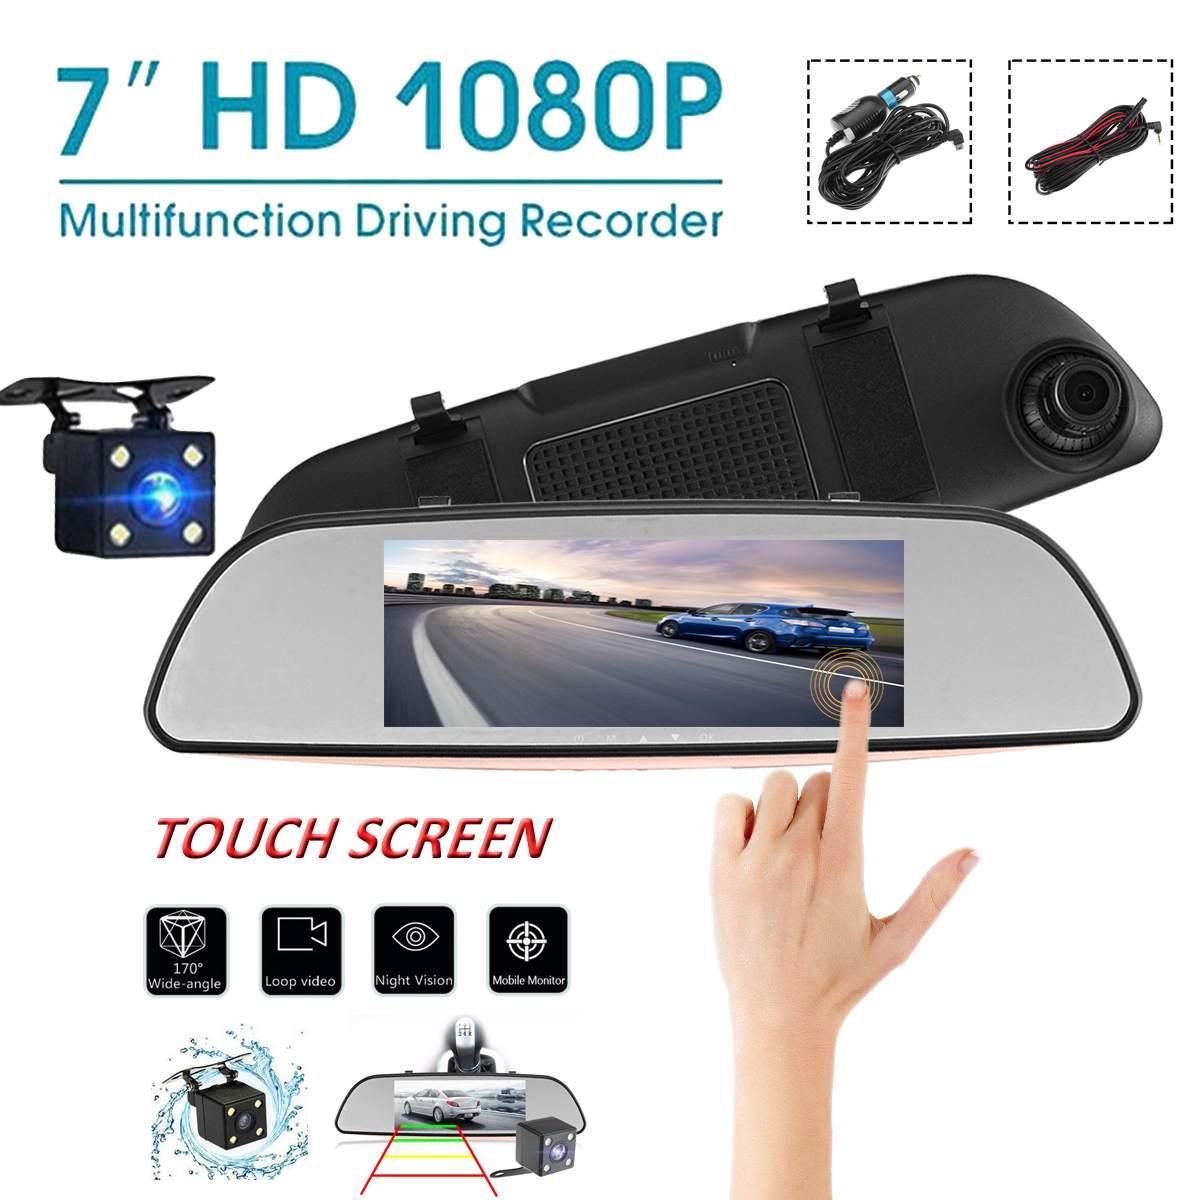 7 Inch Touch Screen 1080P Car DVR Dual Lens Rear view Camera Mirror Video Recorder Dash Cam Auto Video Recorder Parking Dash Cam